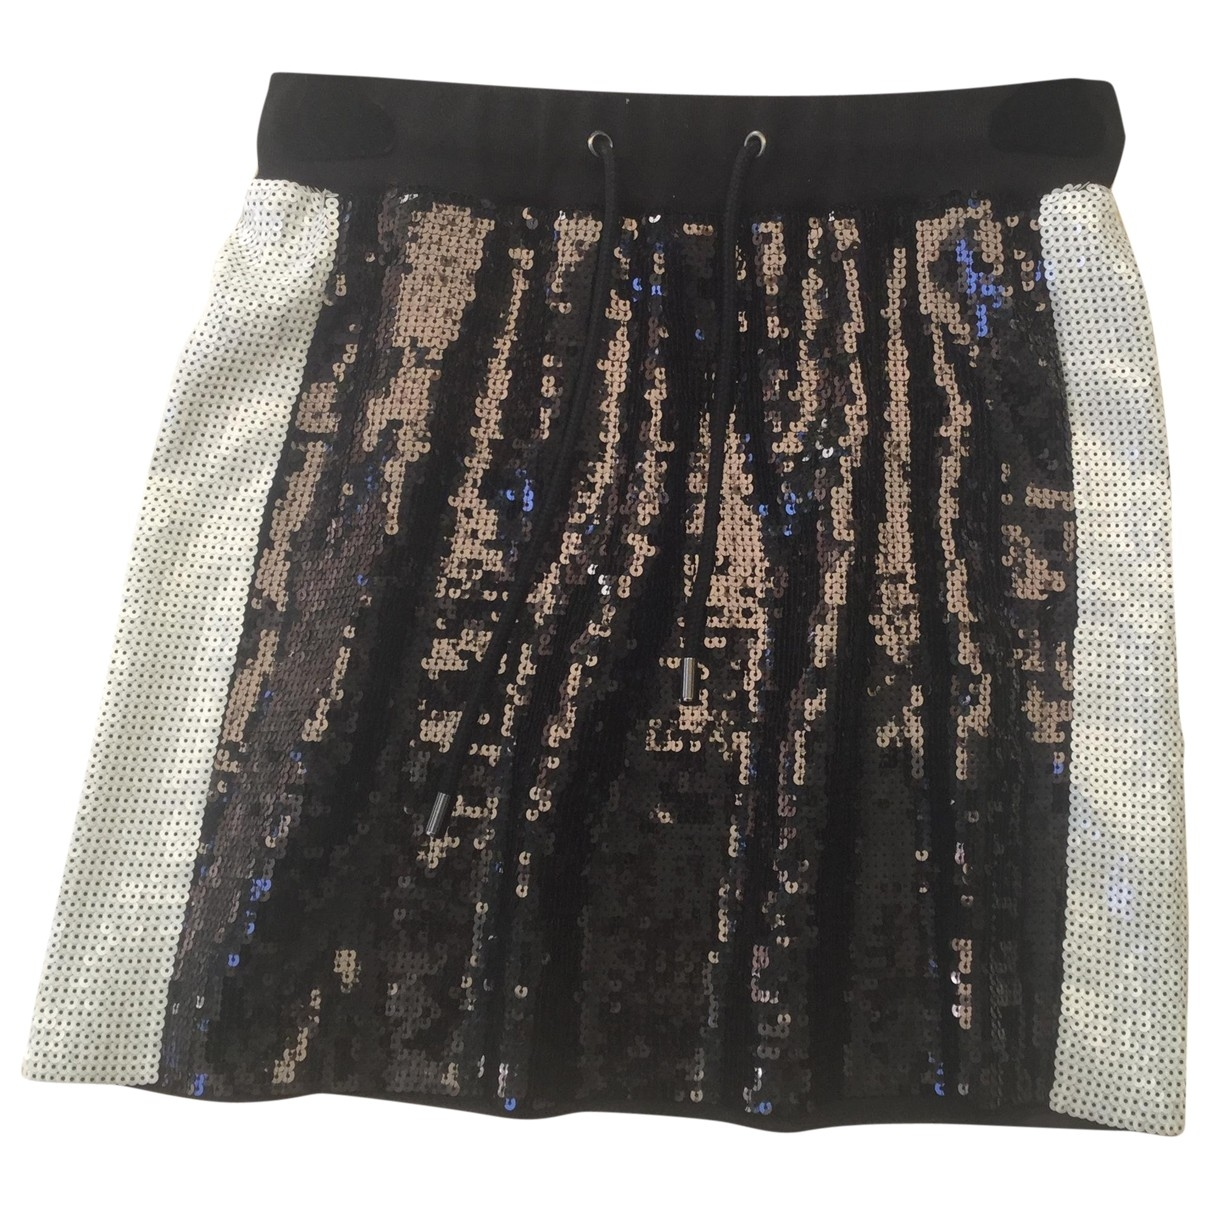 Alberta Ferretti \N Black Glitter skirt for Women 40 IT